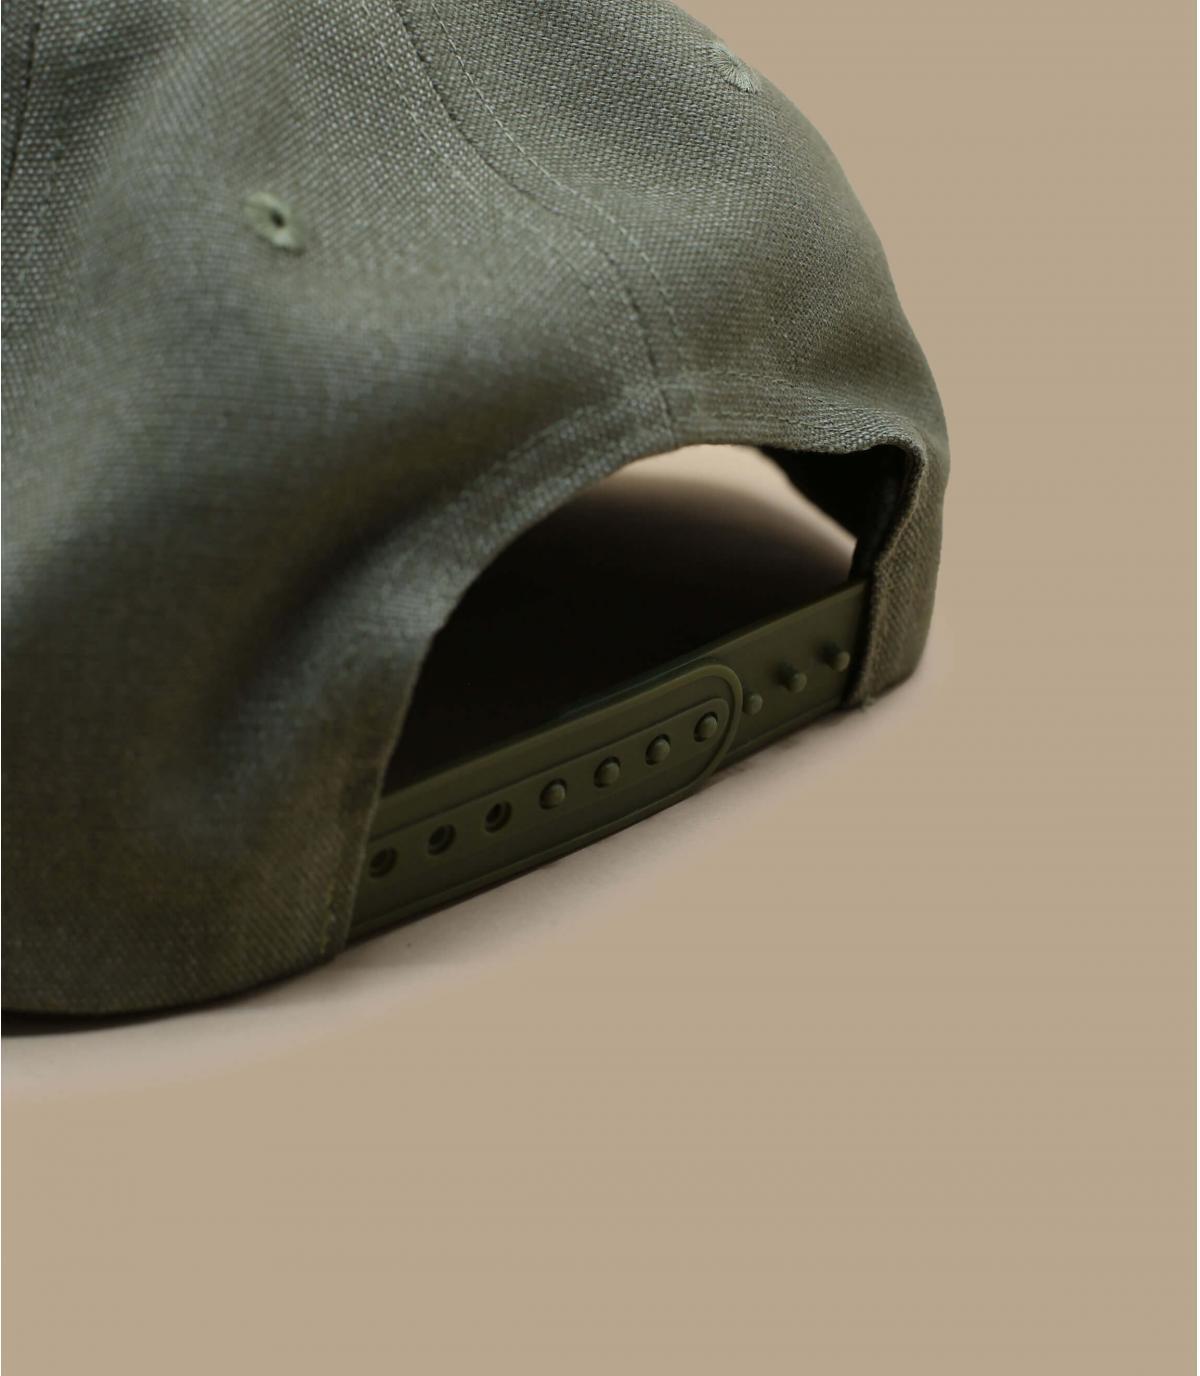 Détails Tin Shed fatigue green - image 4